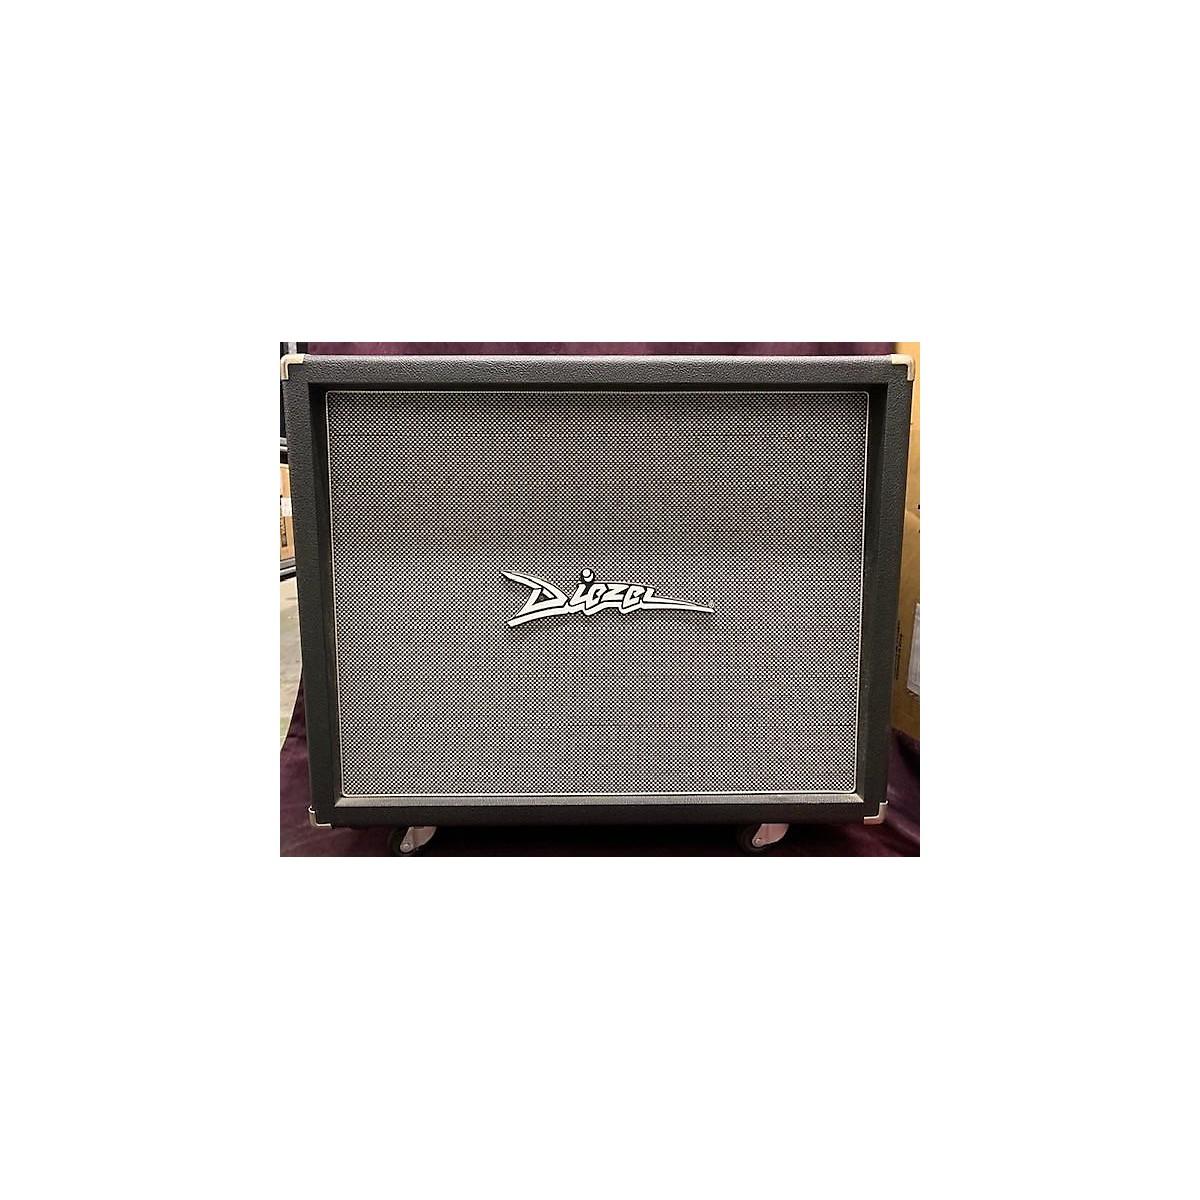 Diezel 212R Guitar Cabinet